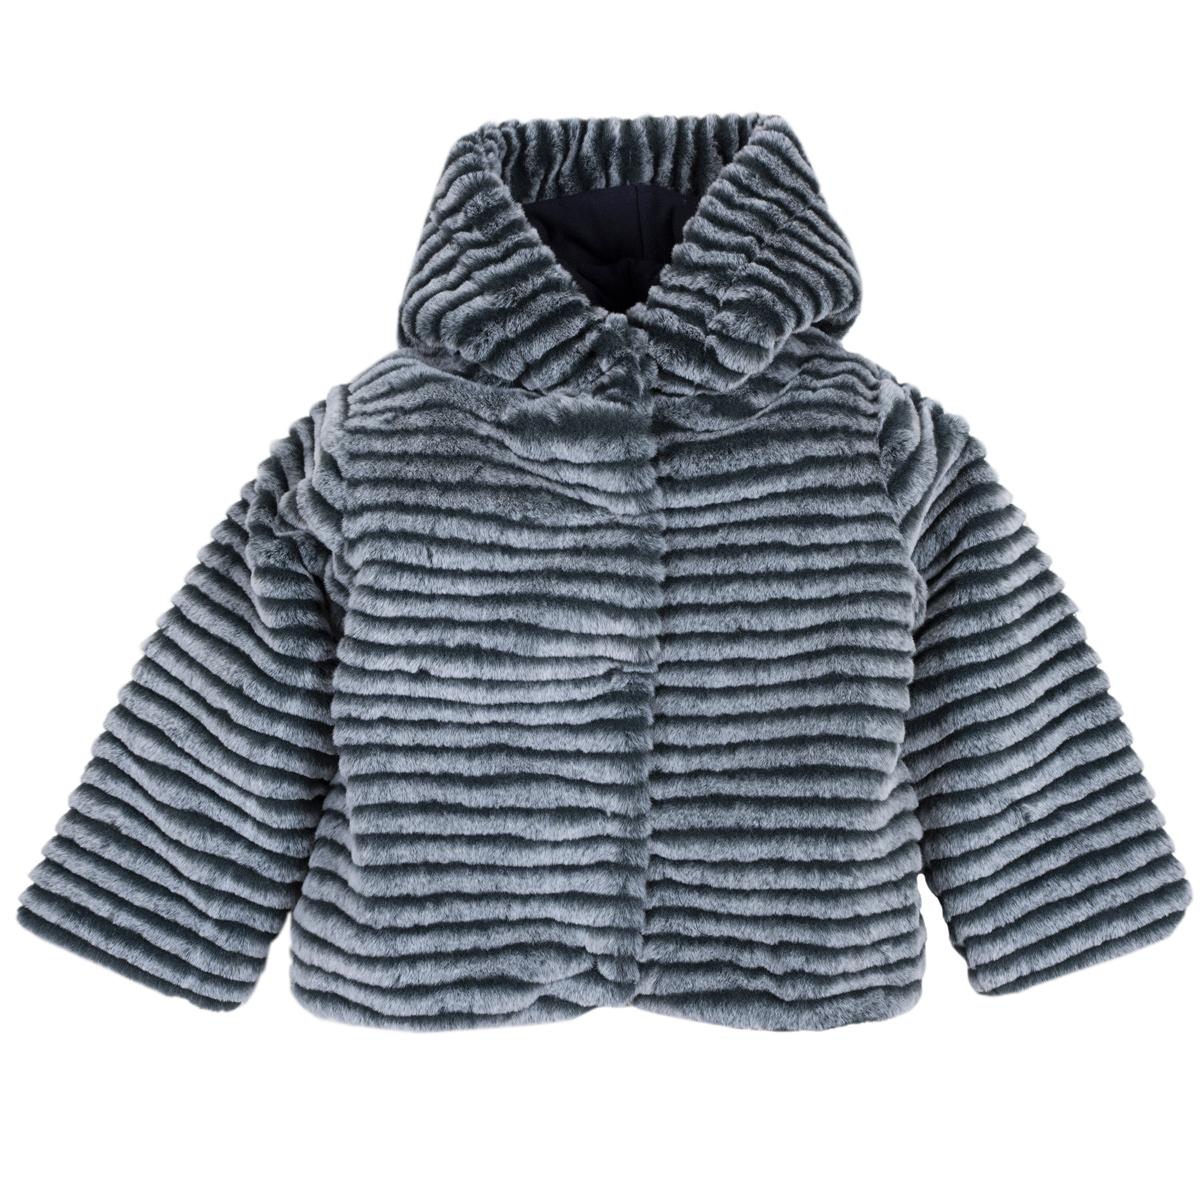 Jacheta copii Chicco, blana artificiala, 96988 din categoria Jachete copii